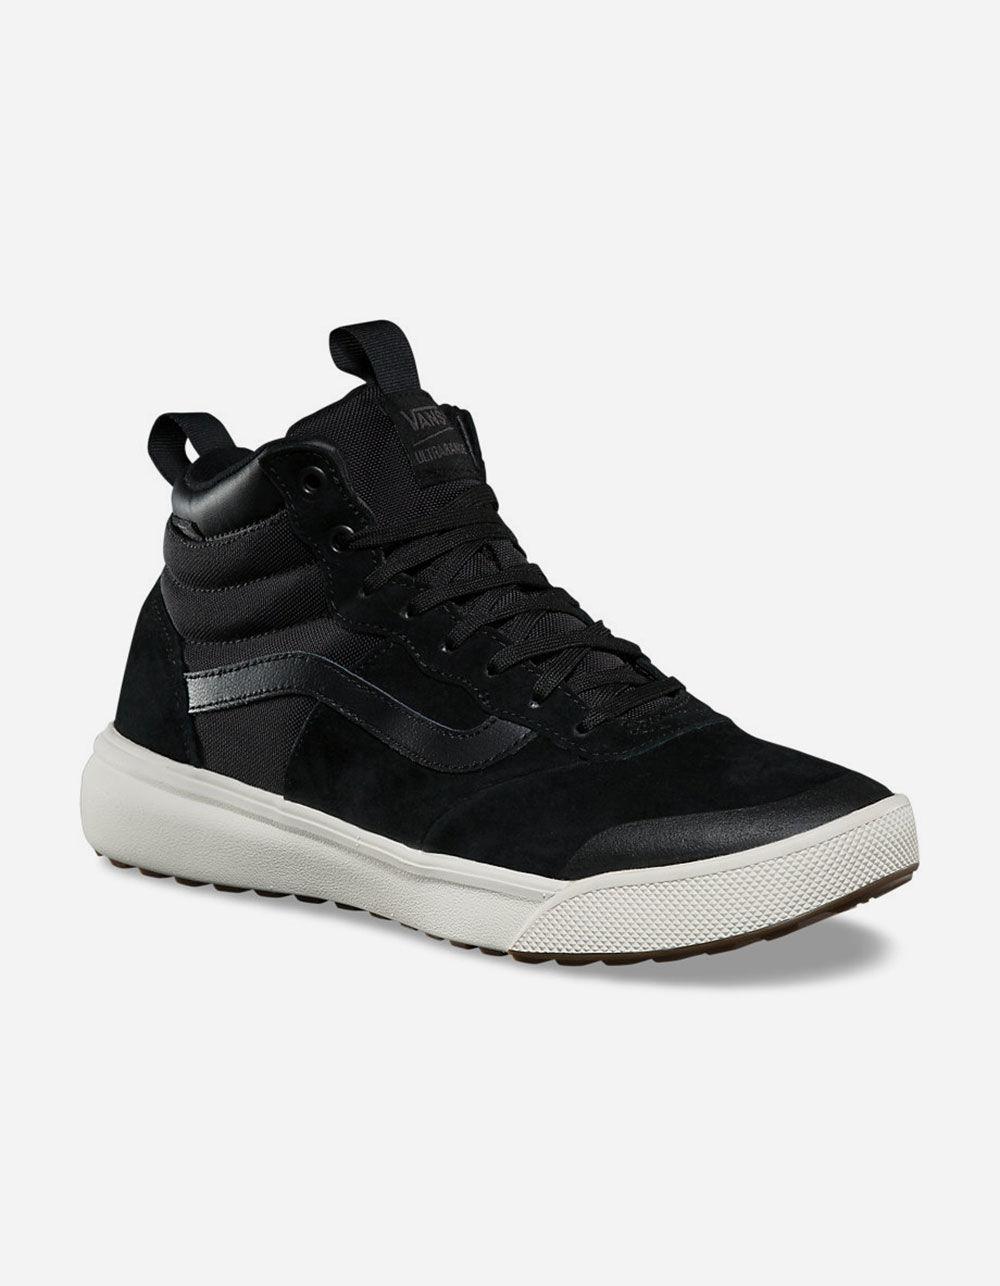 0f235cf8728 Lyst - Vans Ultrarange Hi Mte Mens Shoes in Black for Men